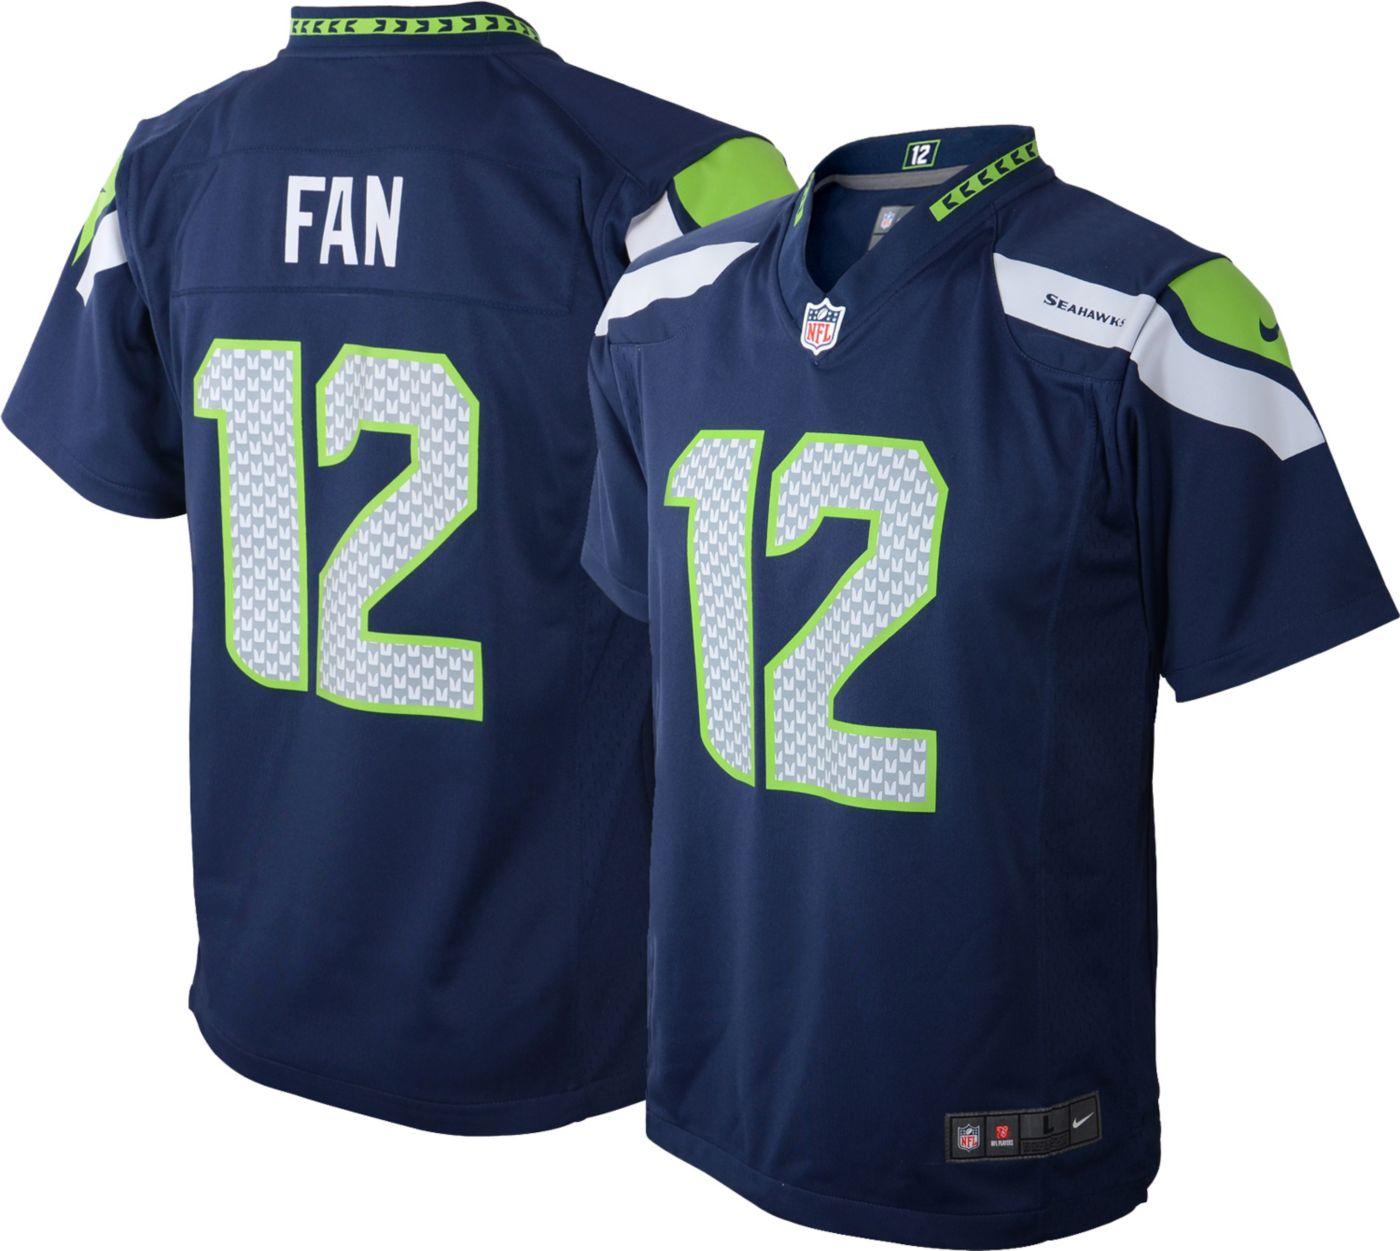 Nike Toddler Home Game Jersey Seattle Seahawks Fan #12